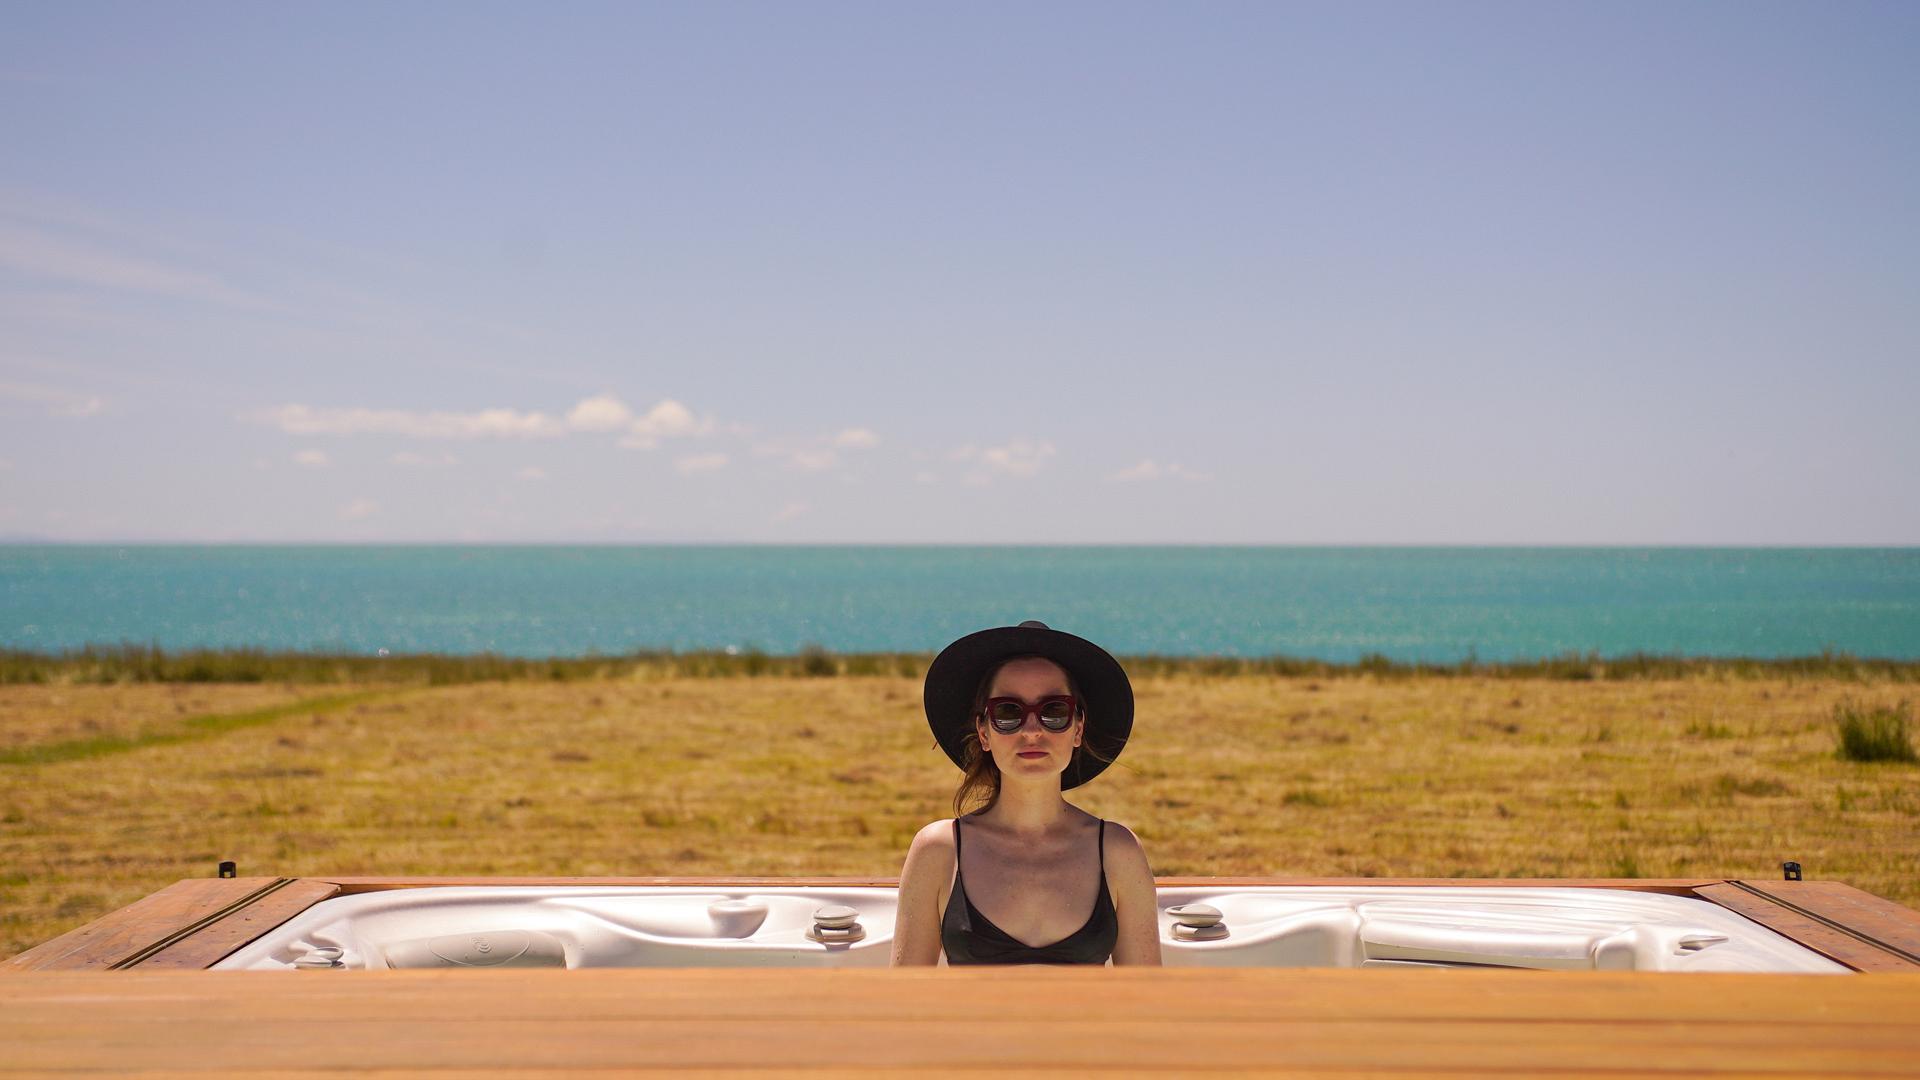 Zoe Lister-Jones shares her beautiful vacation photos